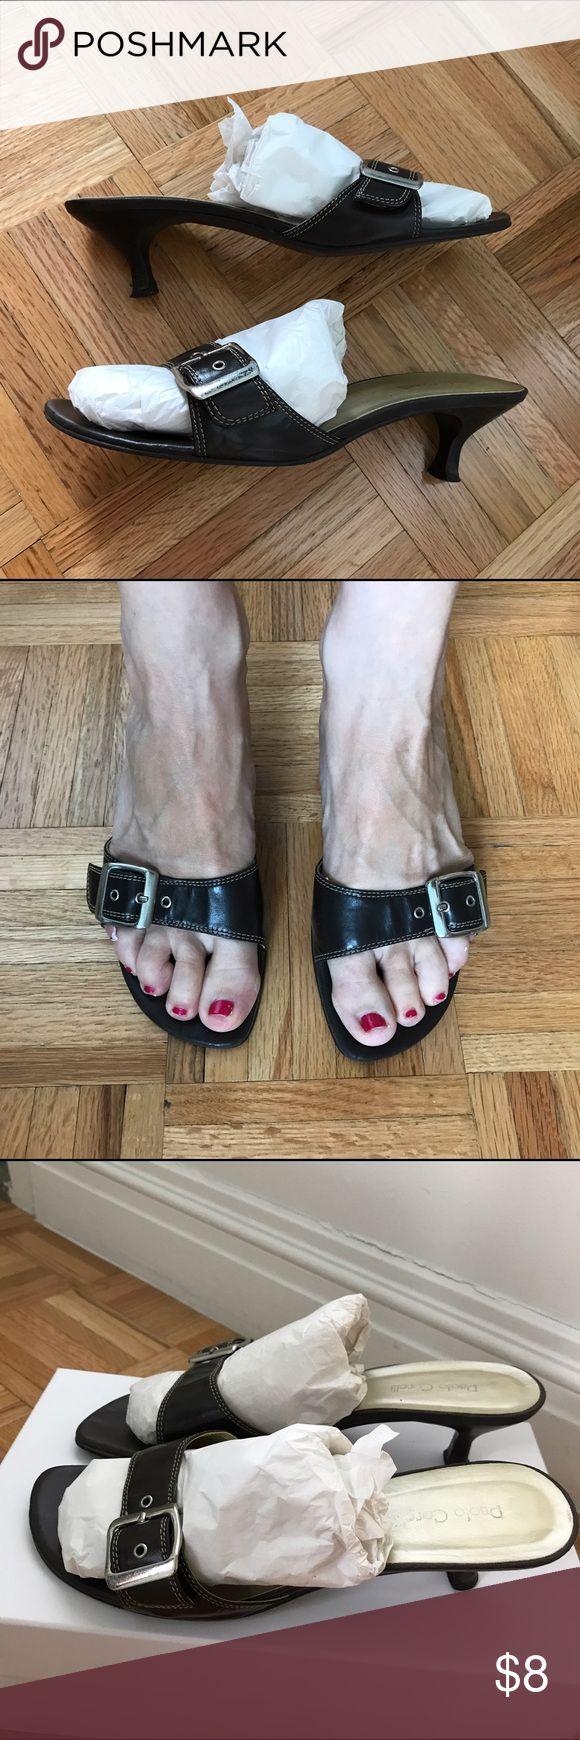 "Dark Brown Kitten Heel Mule Sandal Dark Brown Kitten Heel Mule Sandal. Buckle accent. Paolo Corelli. Leather Upper. 2 1/4"" Heel. Size 7 1/2. Paolo Corelli Shoes Sandals"